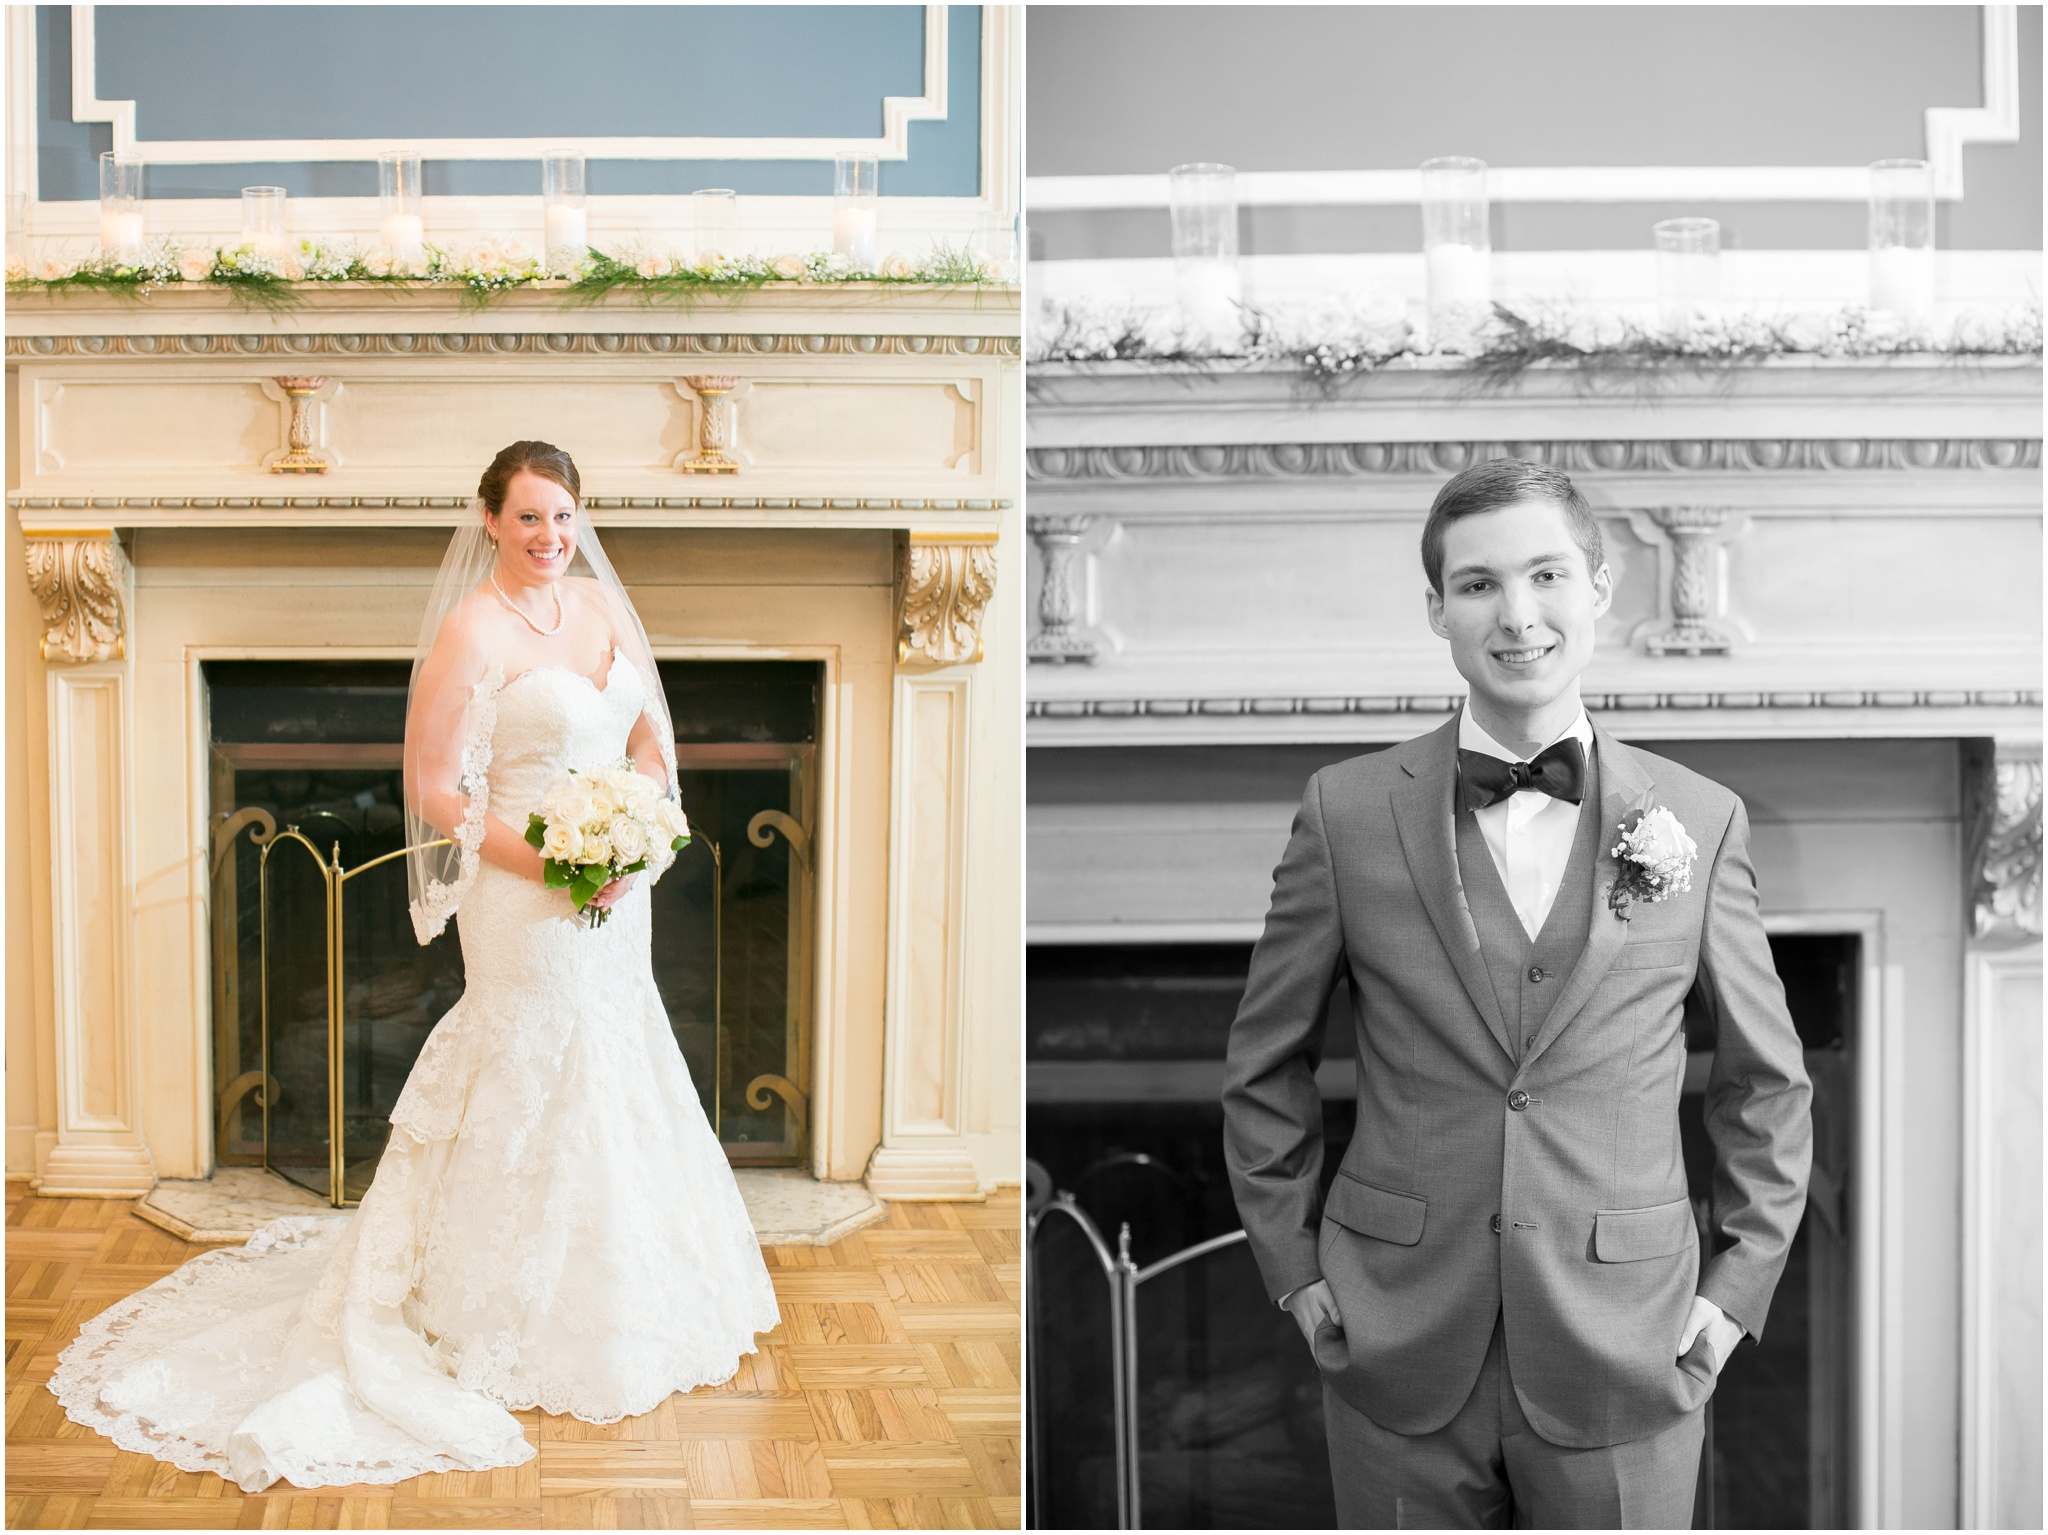 Madison_Club_Madison_Wisconsin_Wedding_Photographer_Spring_Rainy_Wedding_2645.jpg